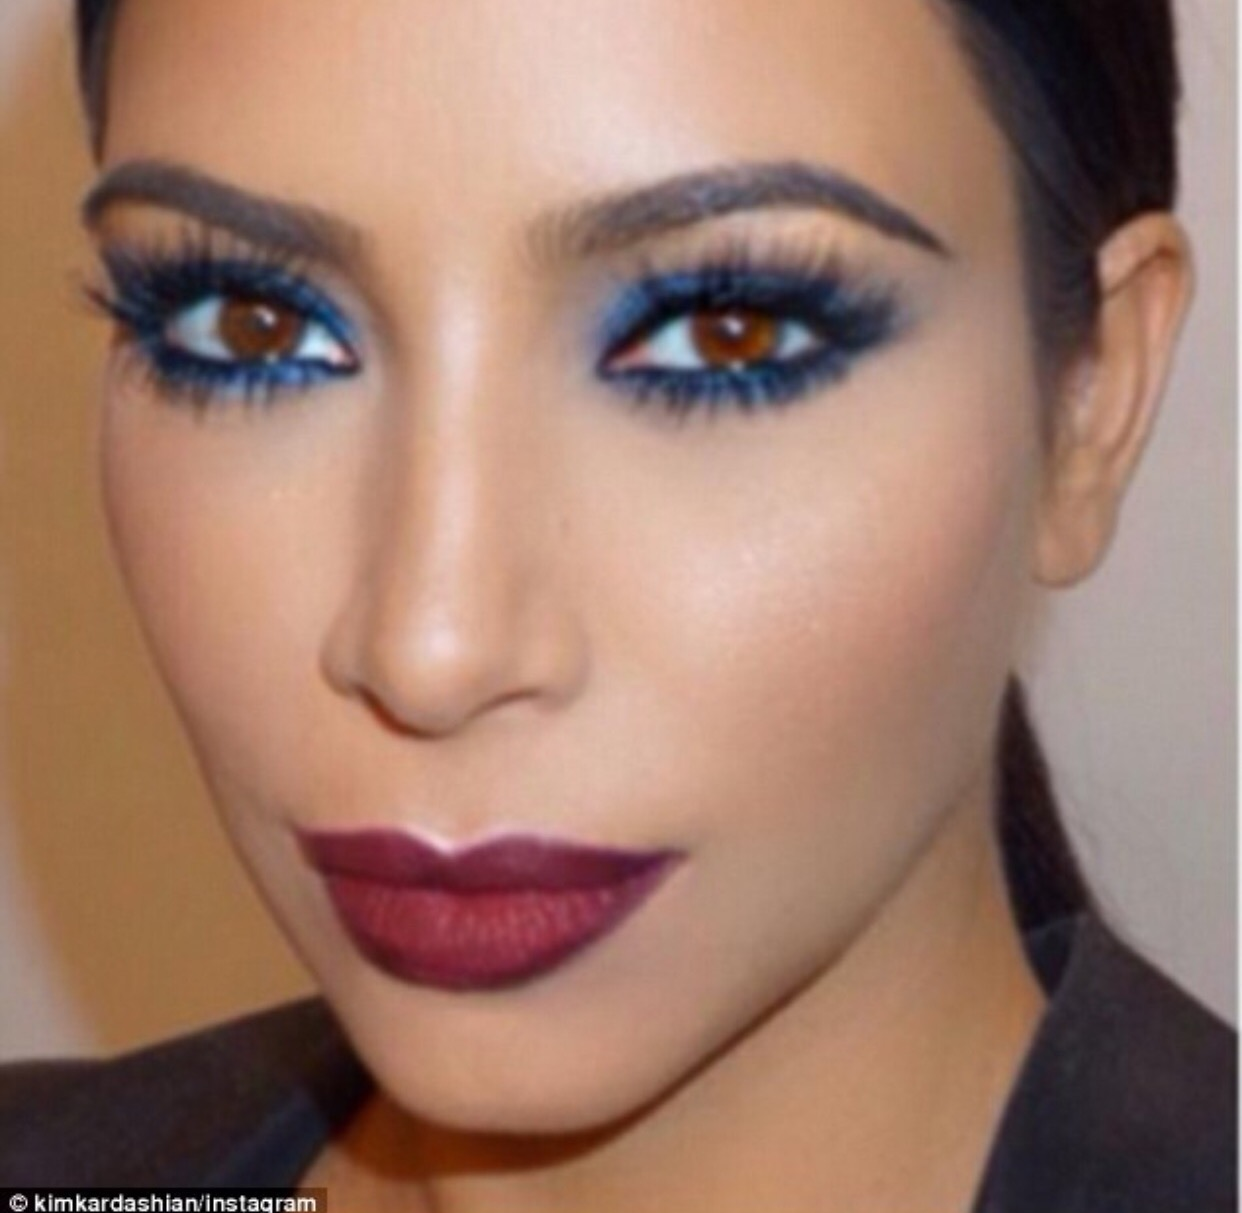 Kim Kardashian Inspired makeup Blue smokey eye